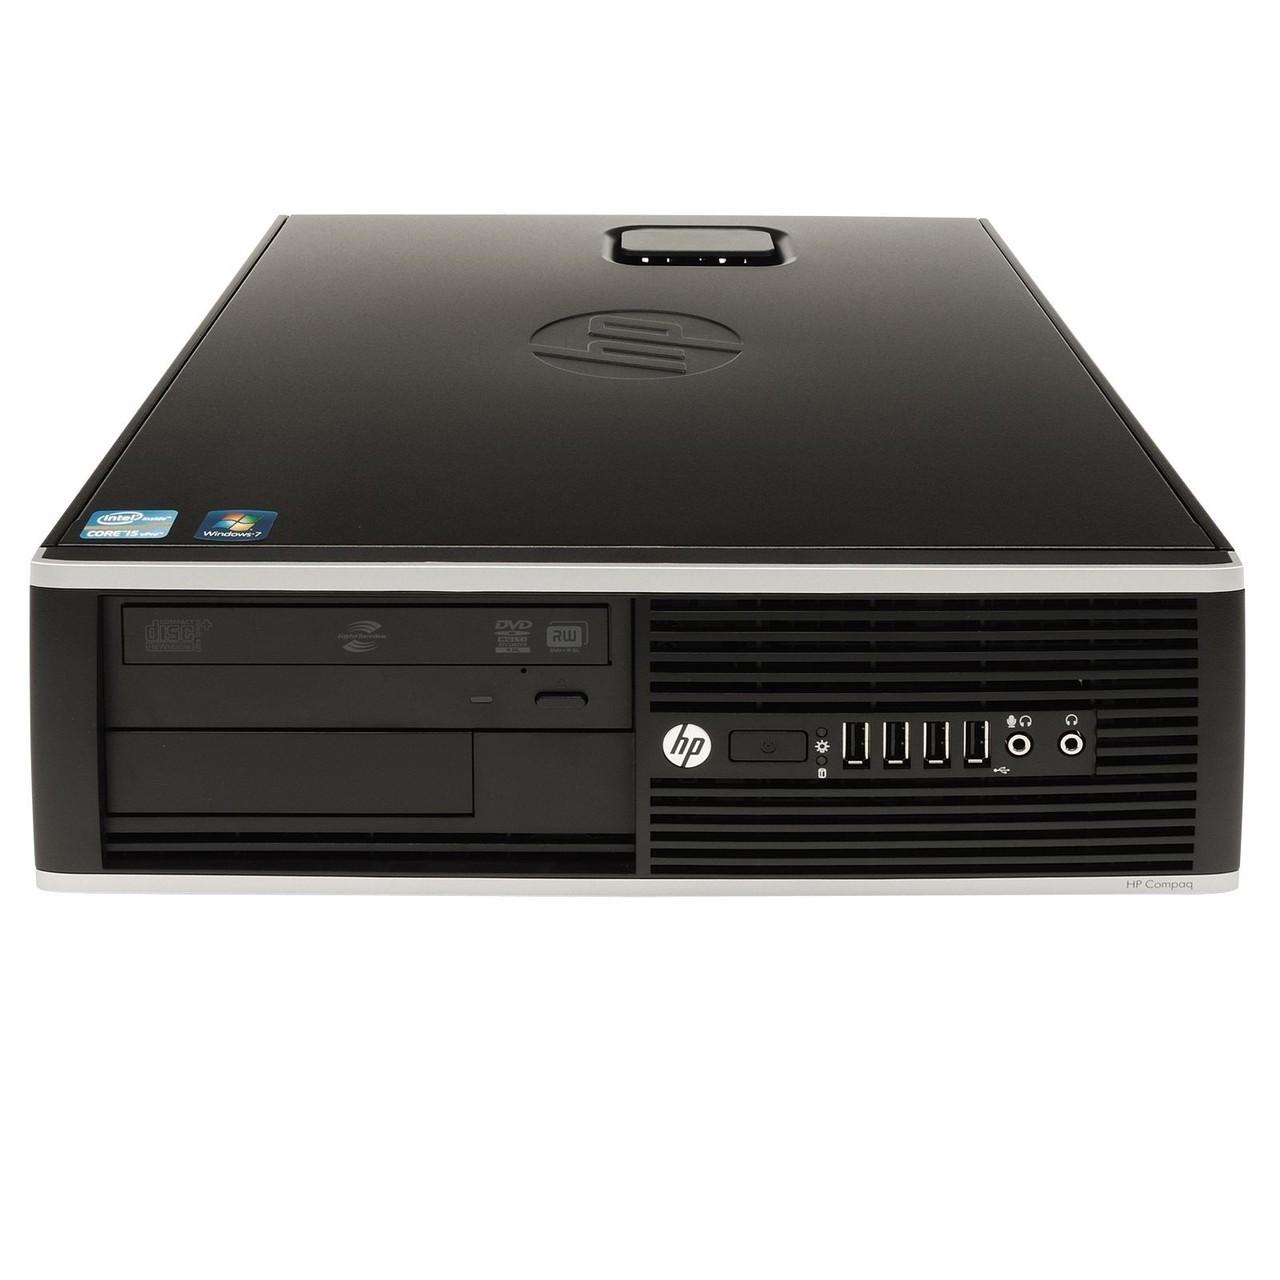 8100 ELITE I5 DESKTOP HP מחשב נייח מעבד I5 זיכרון 4GB דיסק קשיח 500GB ומערכת הפעלה WIN 7 **מחודש**